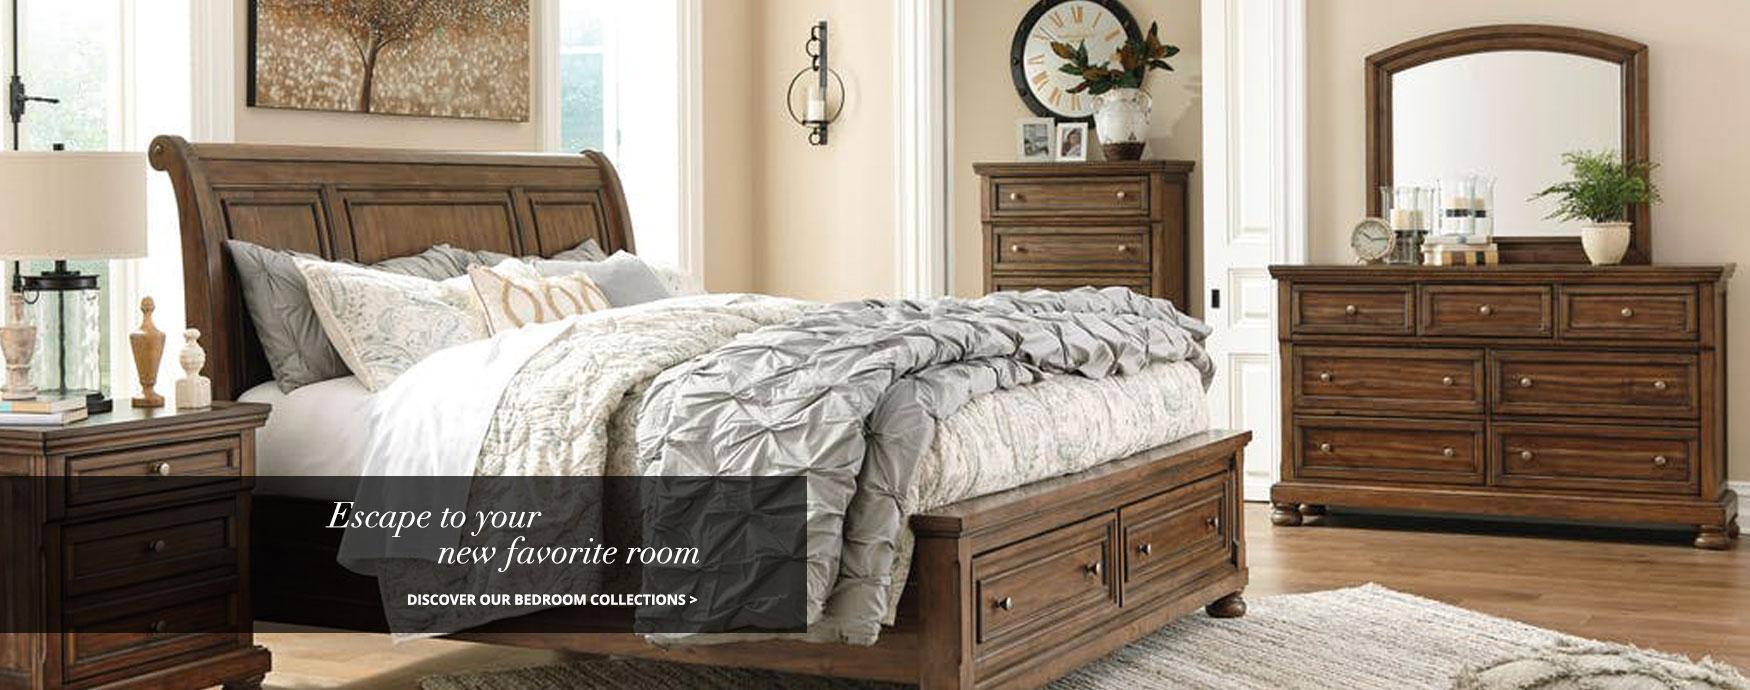 Cramer S Furniture Mattress Store Best Value In Ellensburg Wa